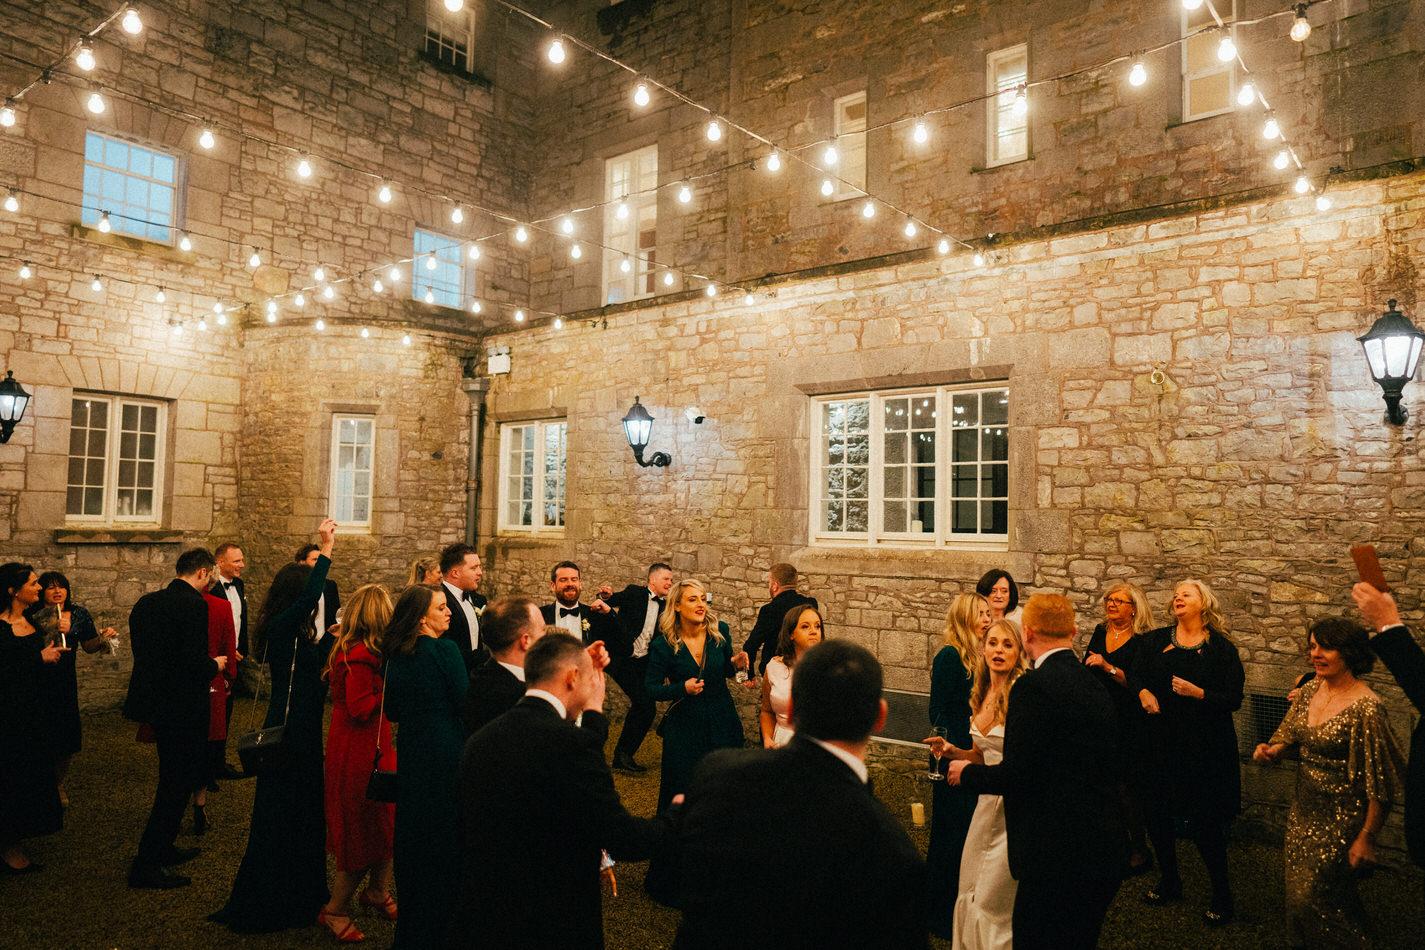 Castle-wedding-ireland-photos- 0348 259